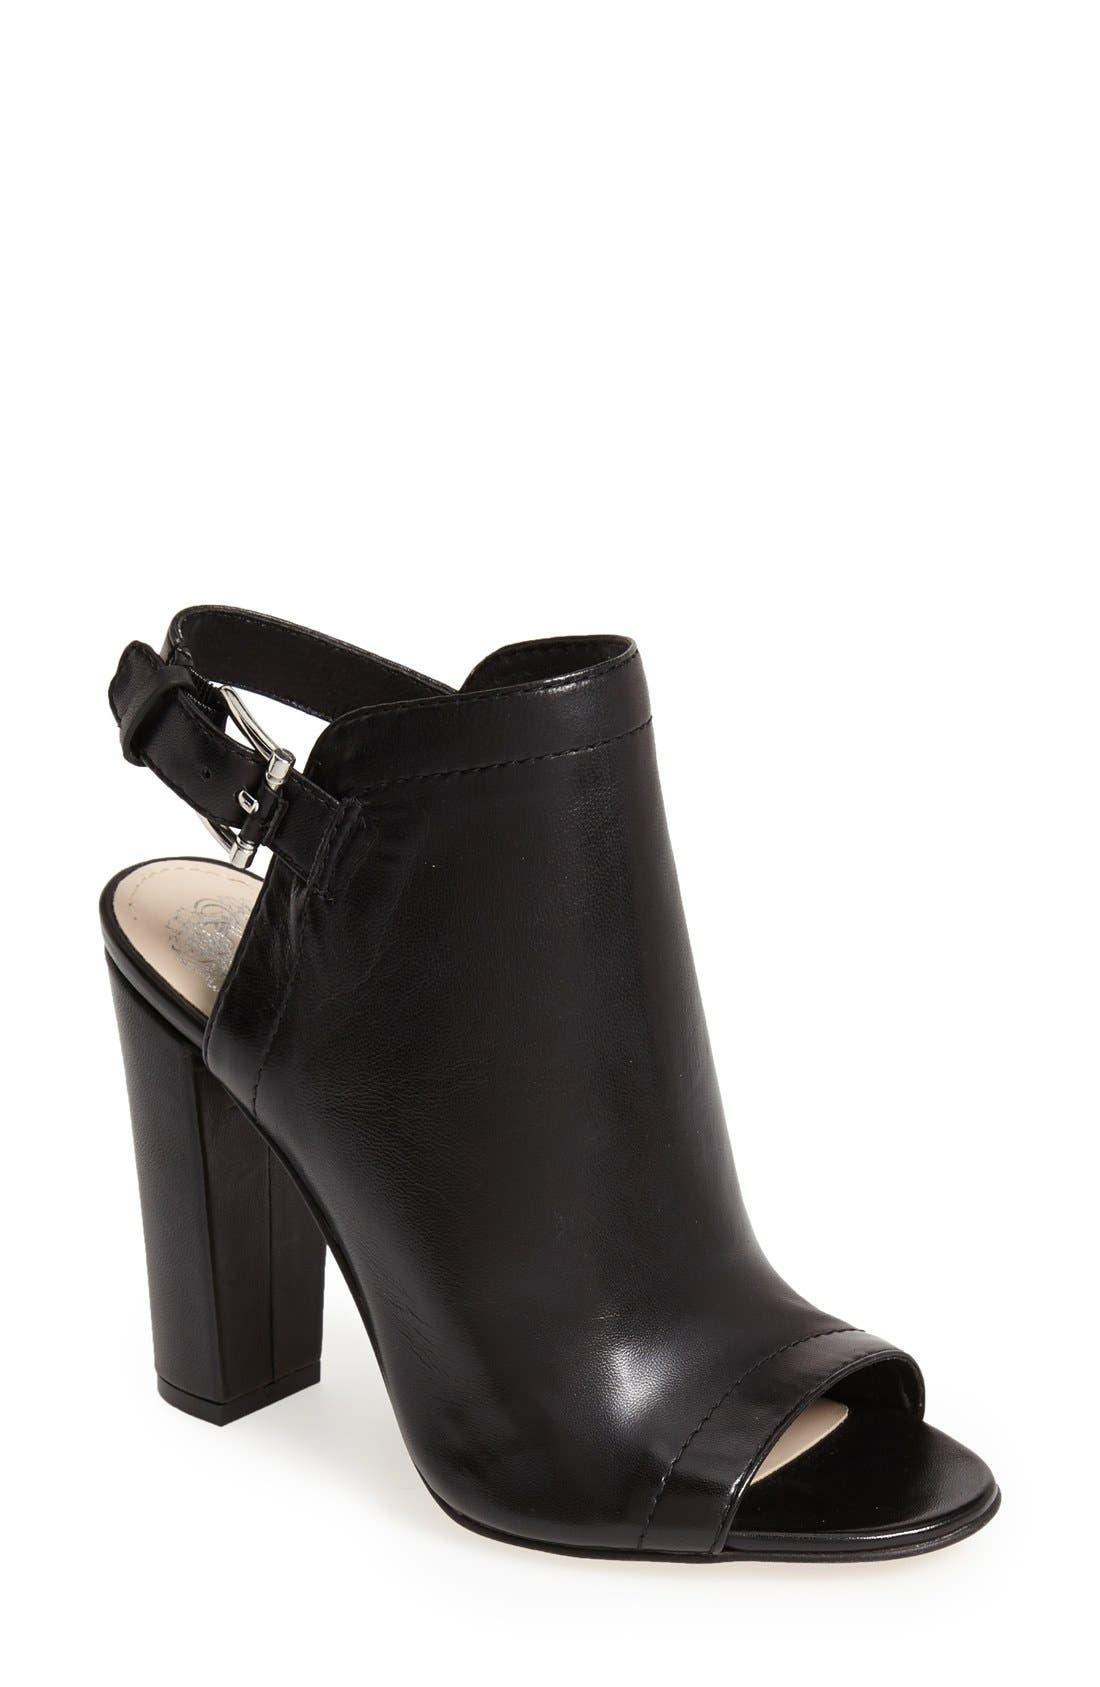 Main Image - Vince Camuto 'Vamelia' Open Toe Leather Bootie (Women)